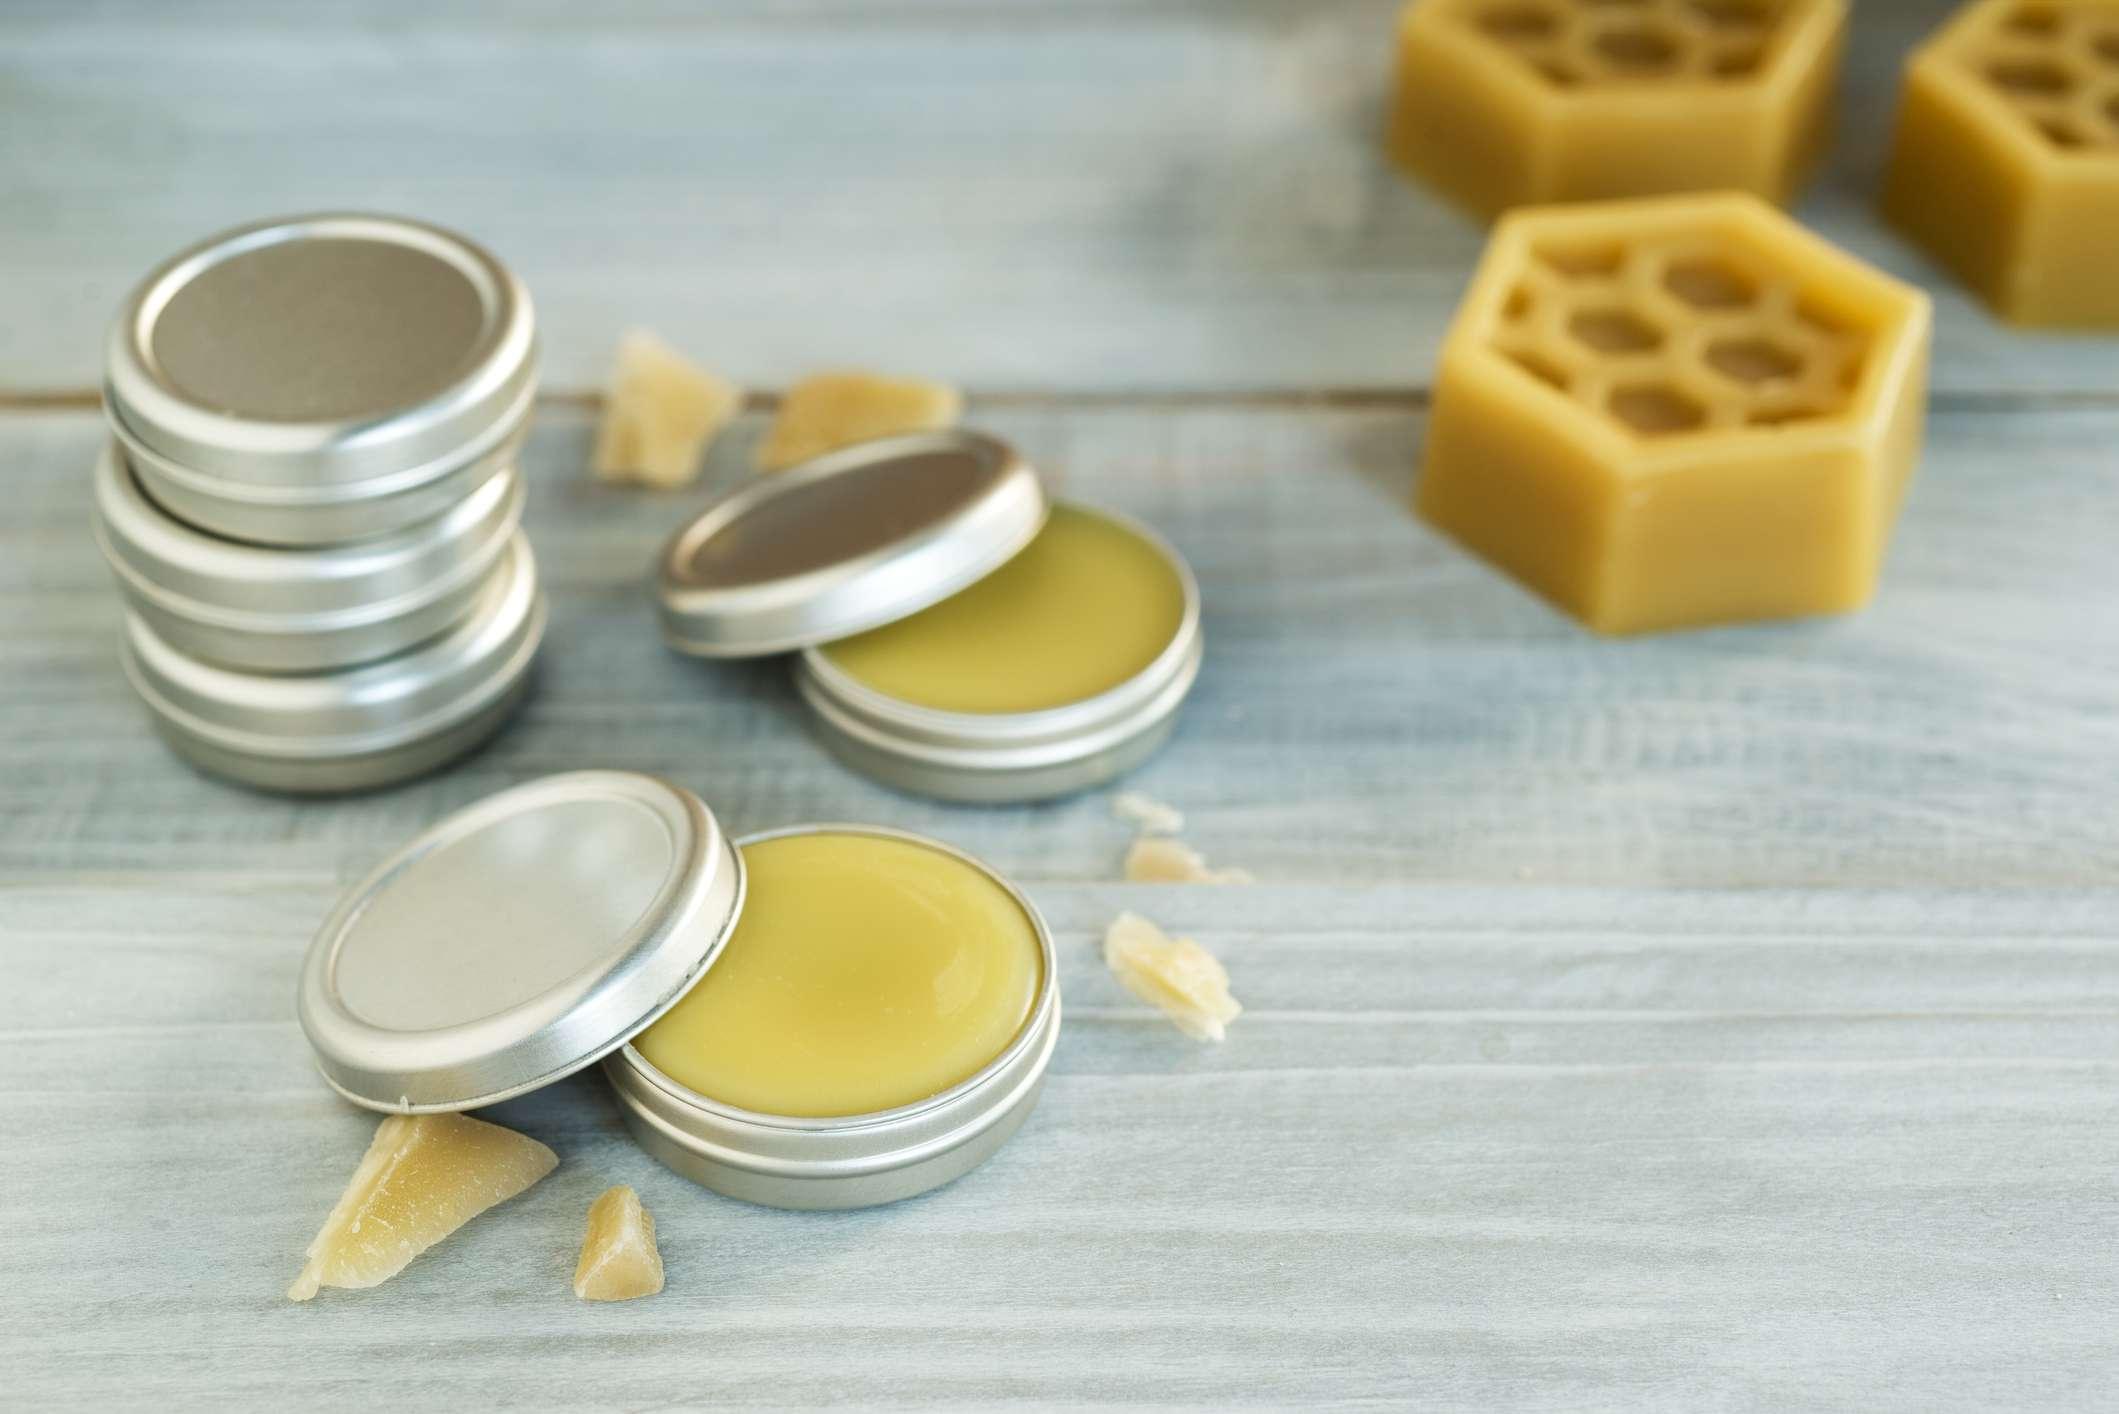 Beeswax base soothing homemade lip balm.